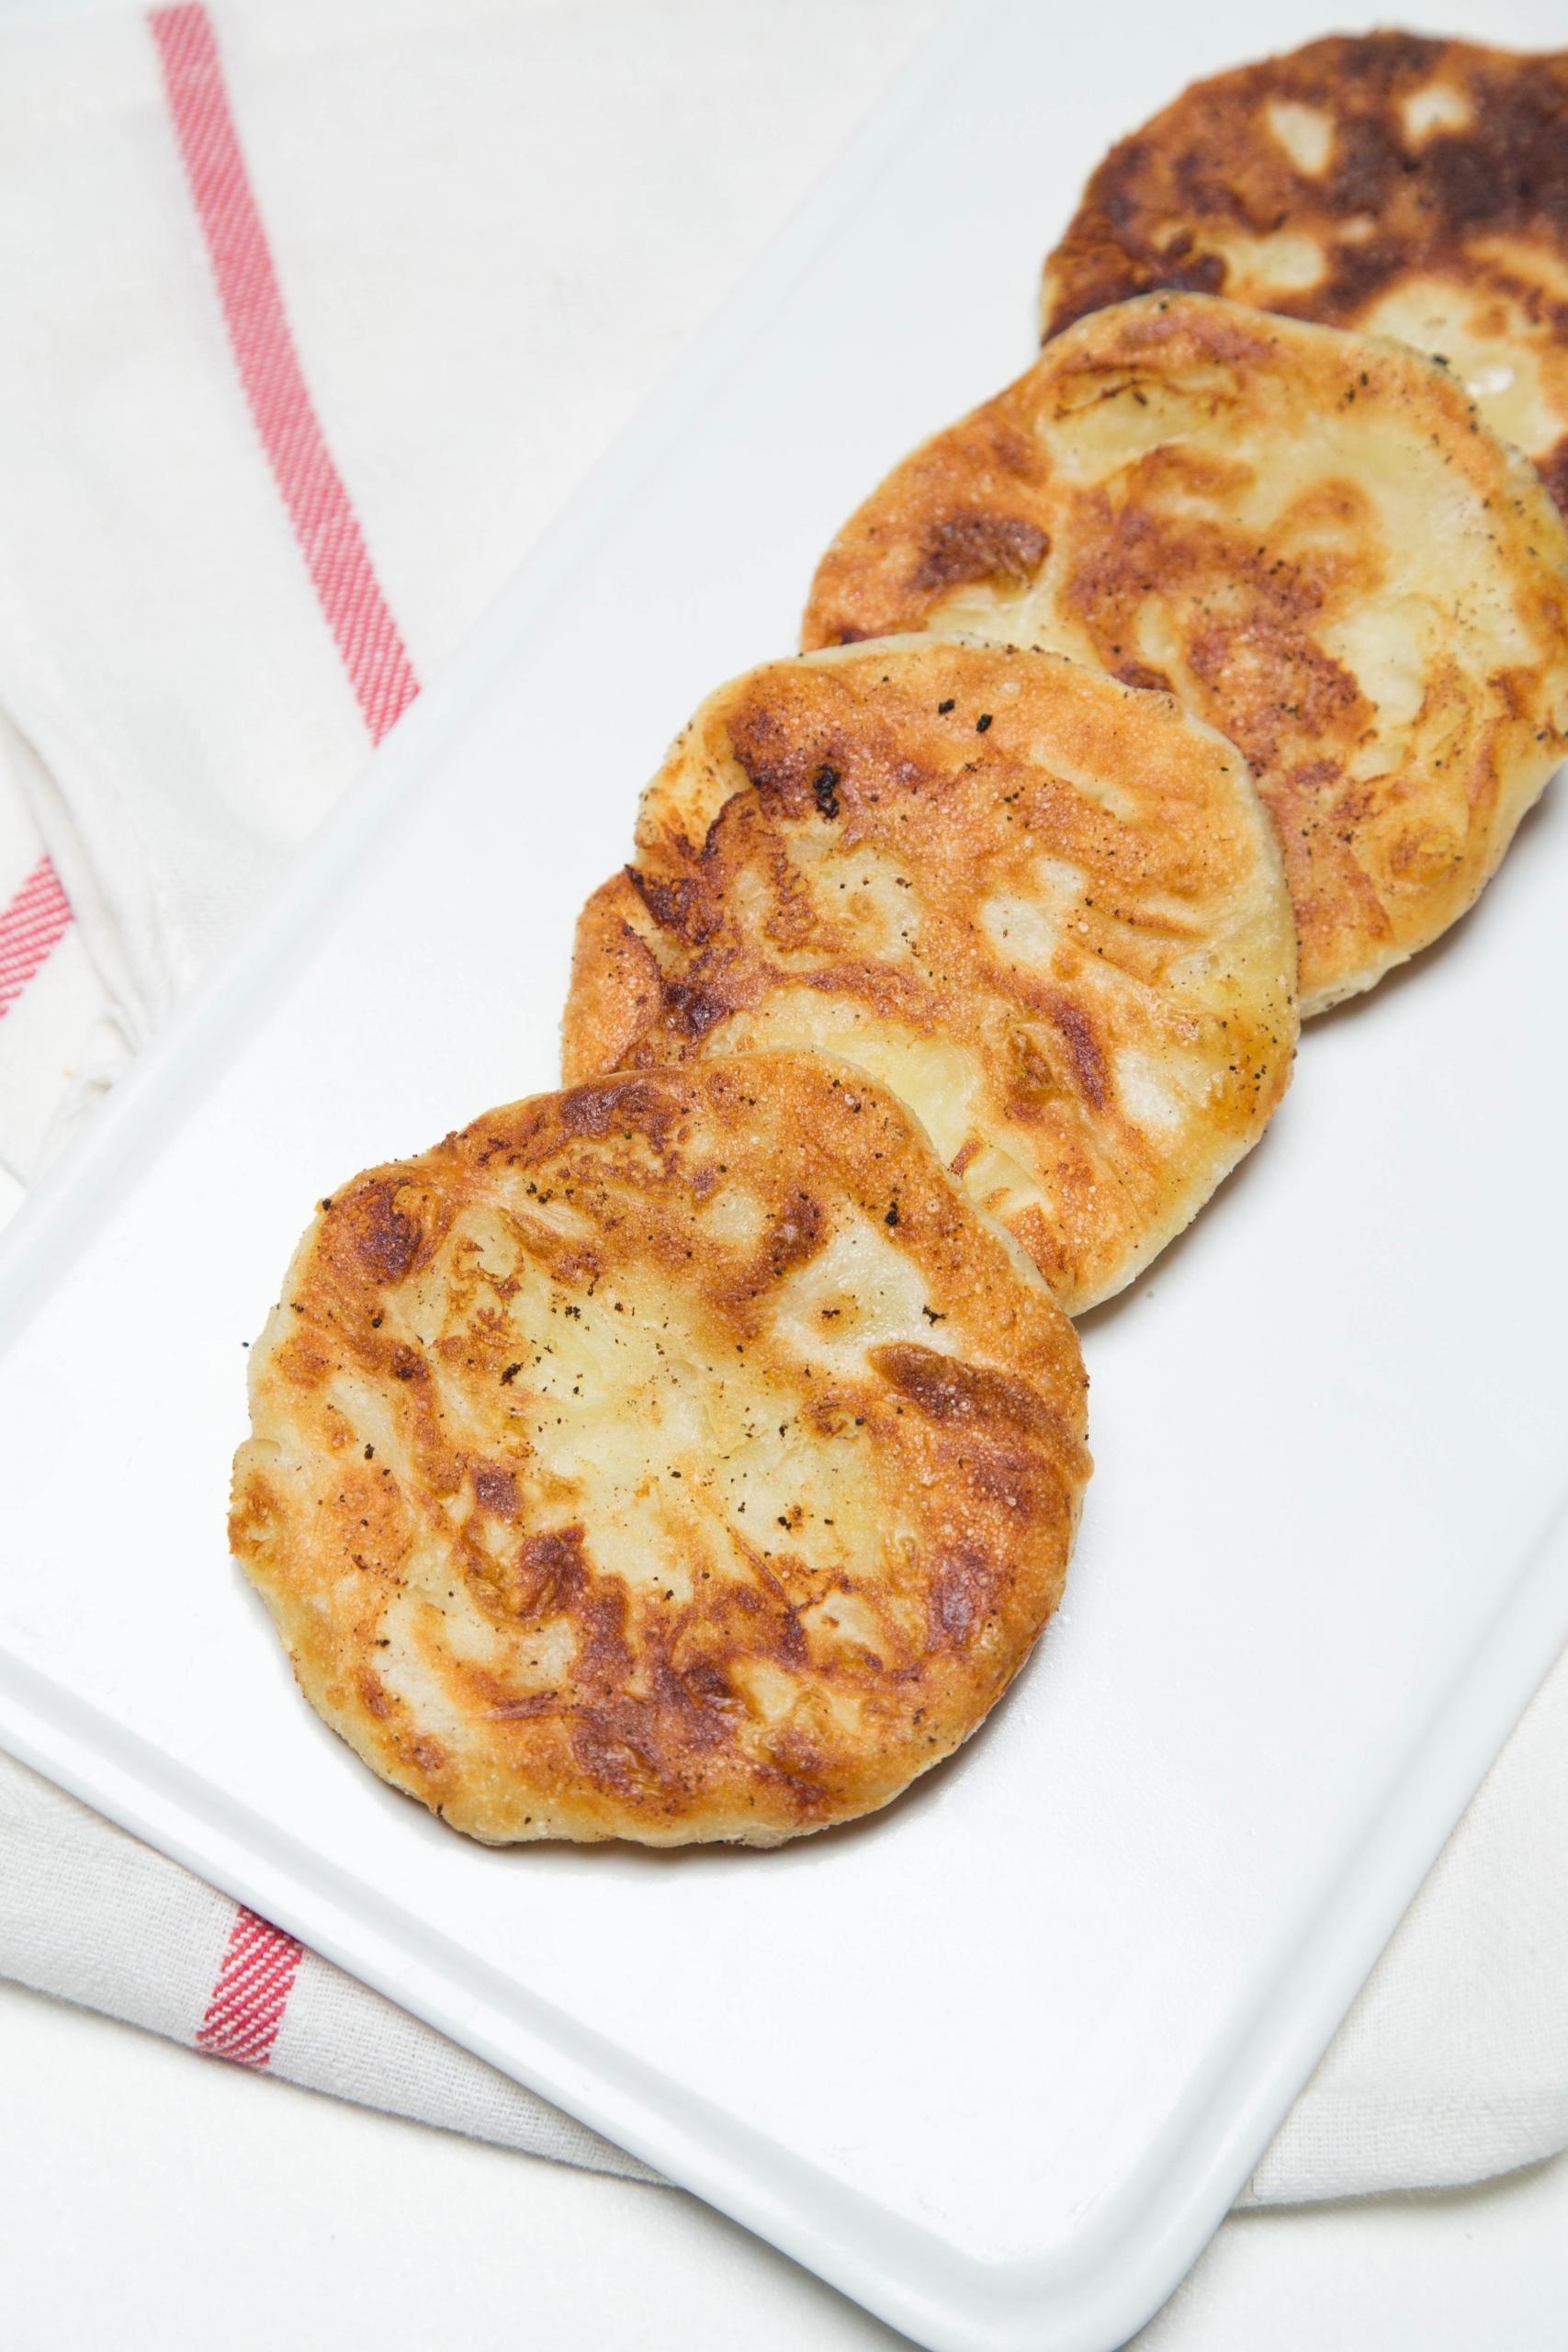 Potato Piroshki in a row on a plate